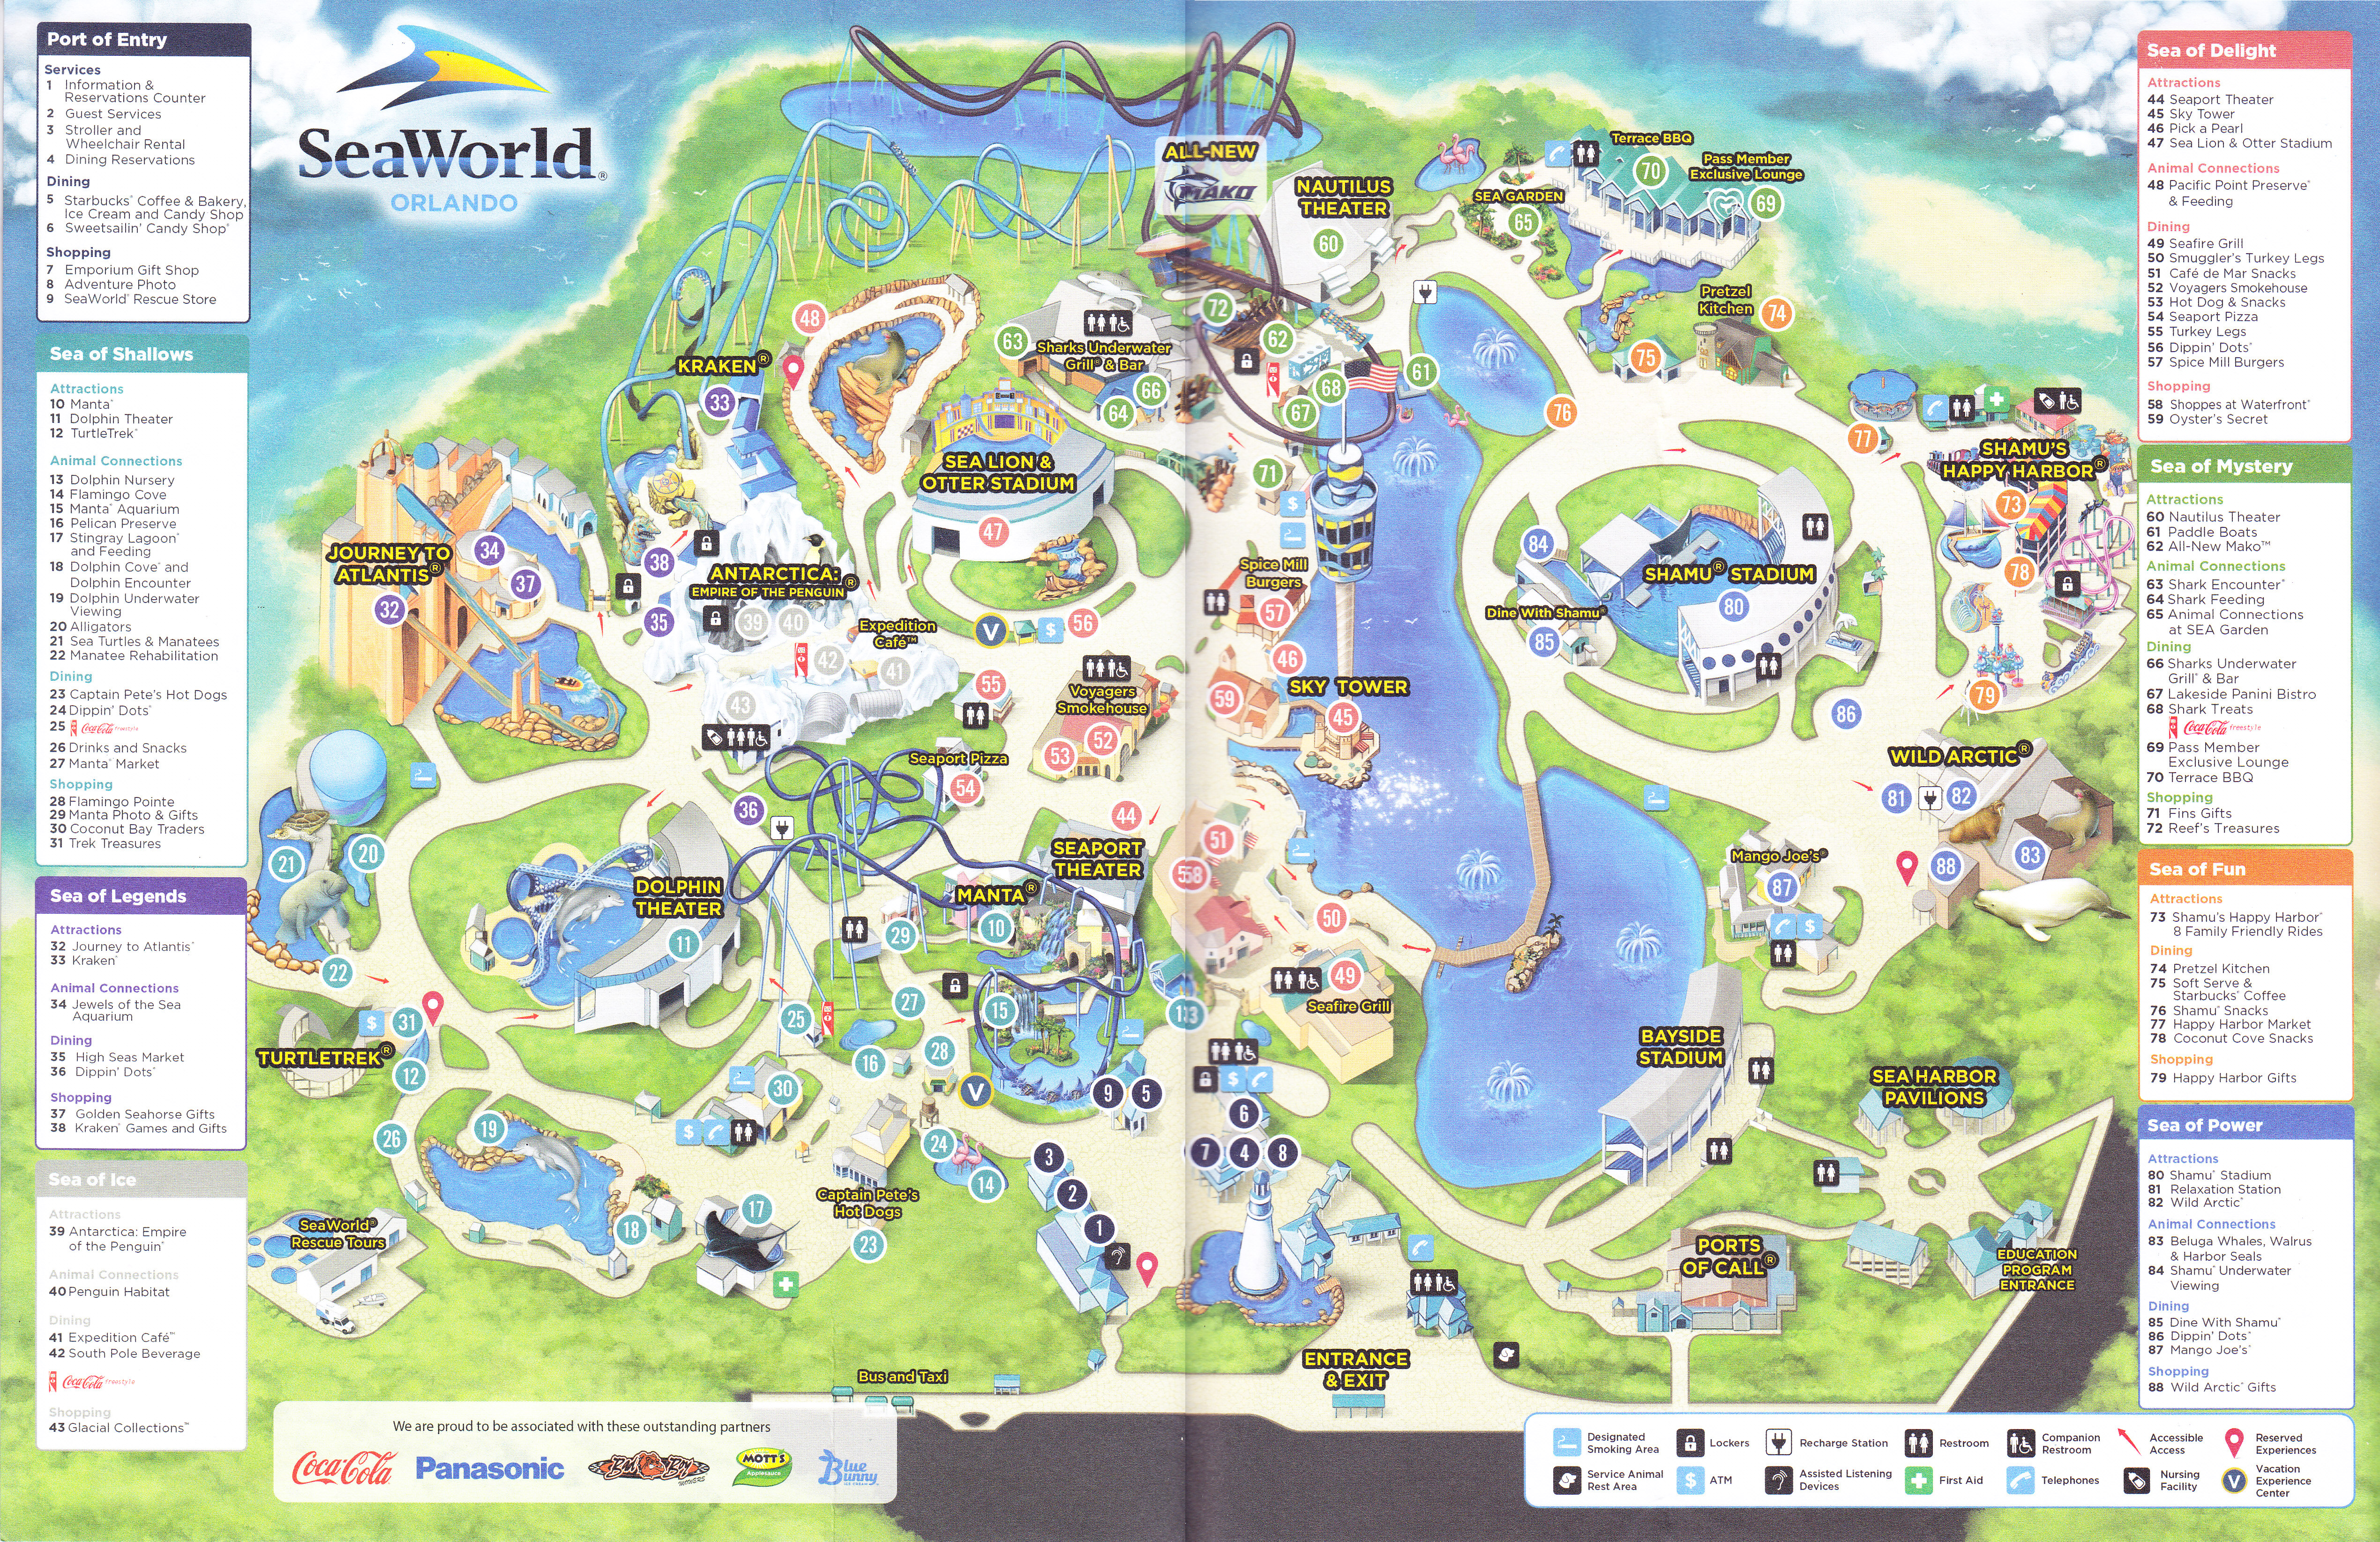 sea world map 2016 Seaworld Of Orlando 2016 Park Map